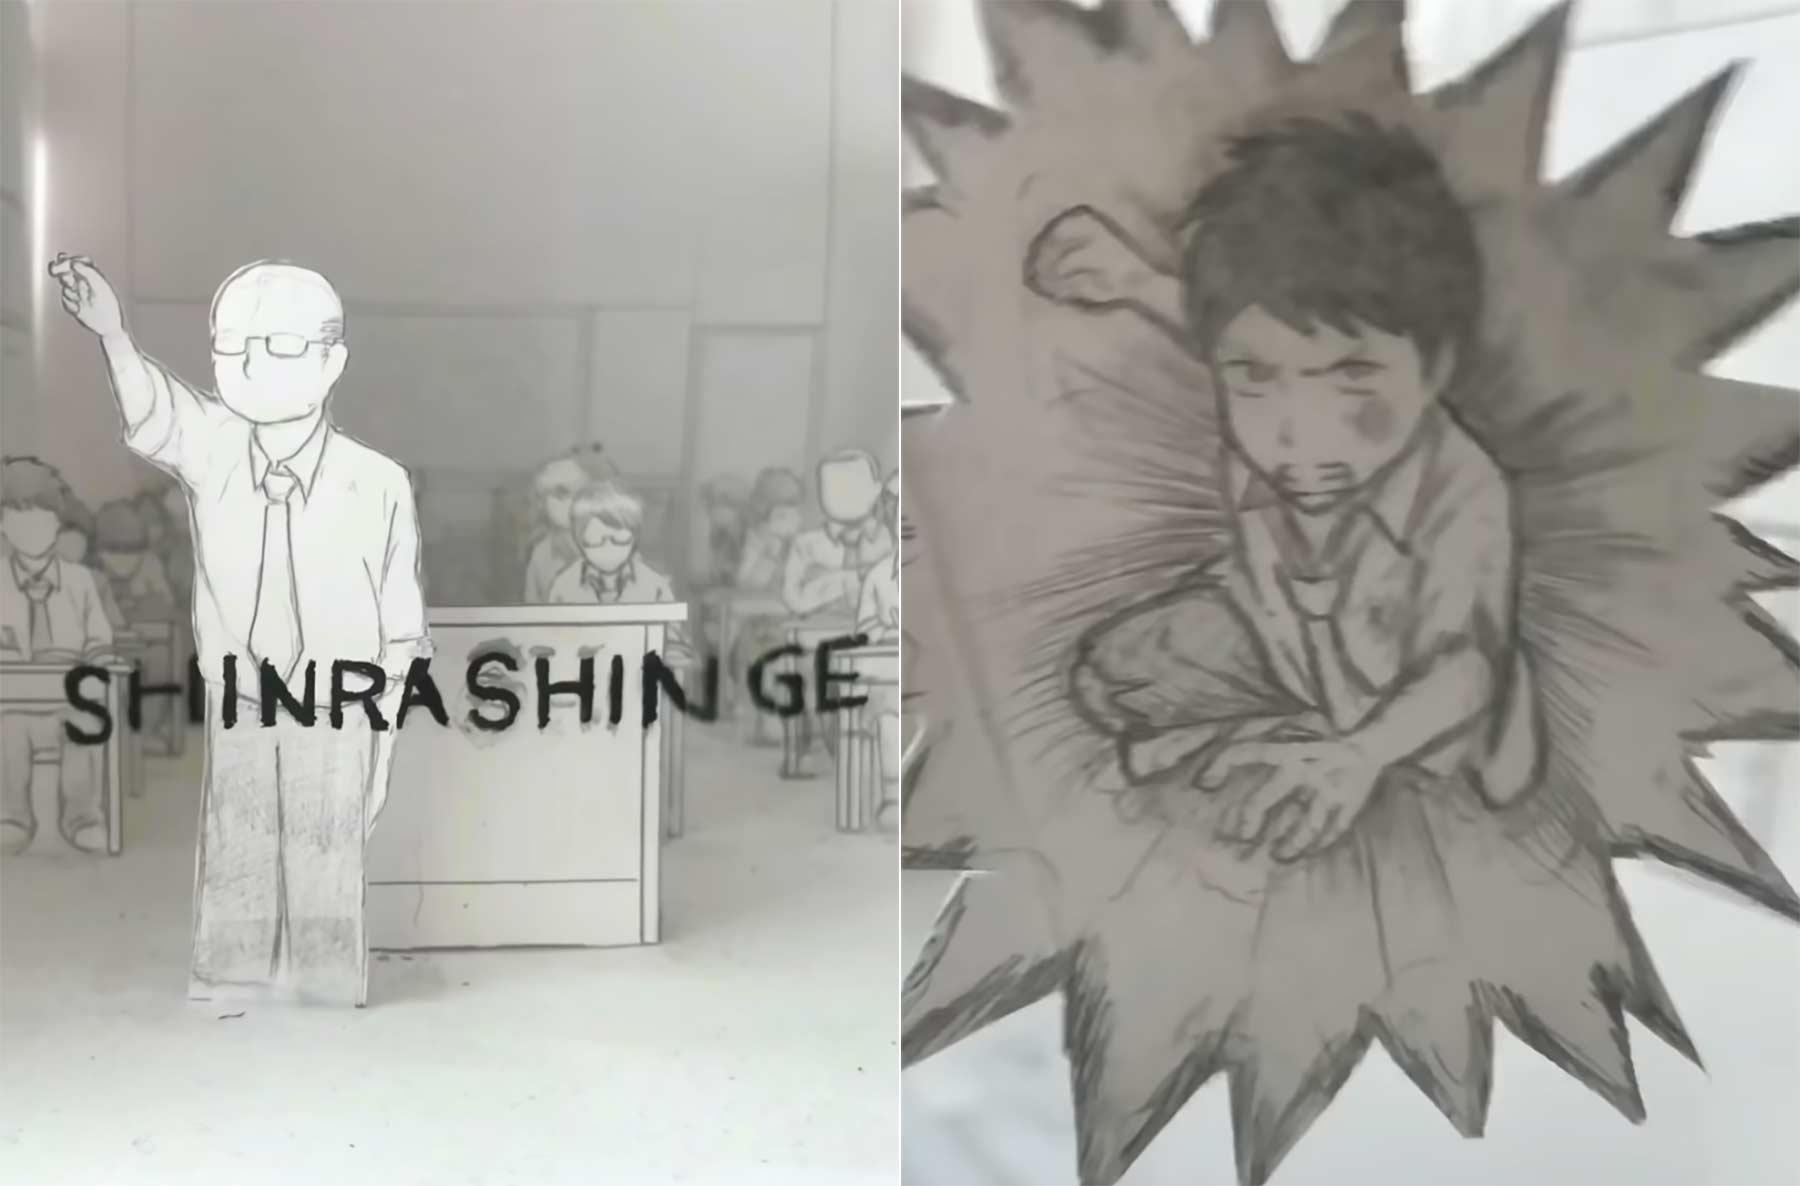 Gezeichneter Manga-Kurzfilm in einem Take shin-shinrashinge-mai-krankheit-one-take-manga